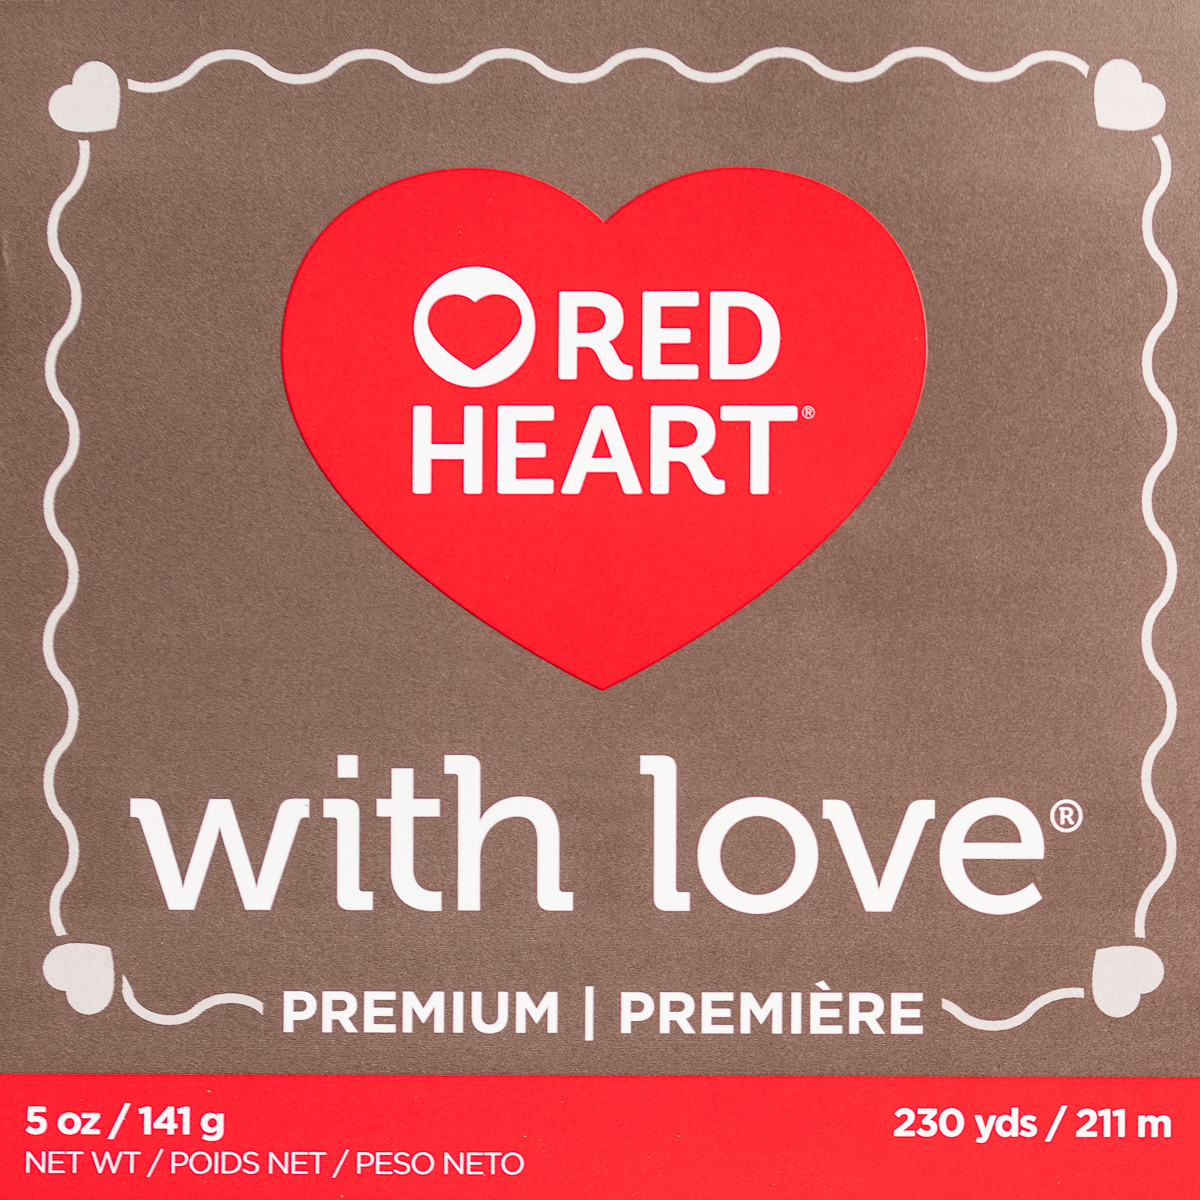 Red-Heart-With-Love-100-Acrylic-Yarn-Knitting-Crochet-Medium-4-Skein-Soft thumbnail 16